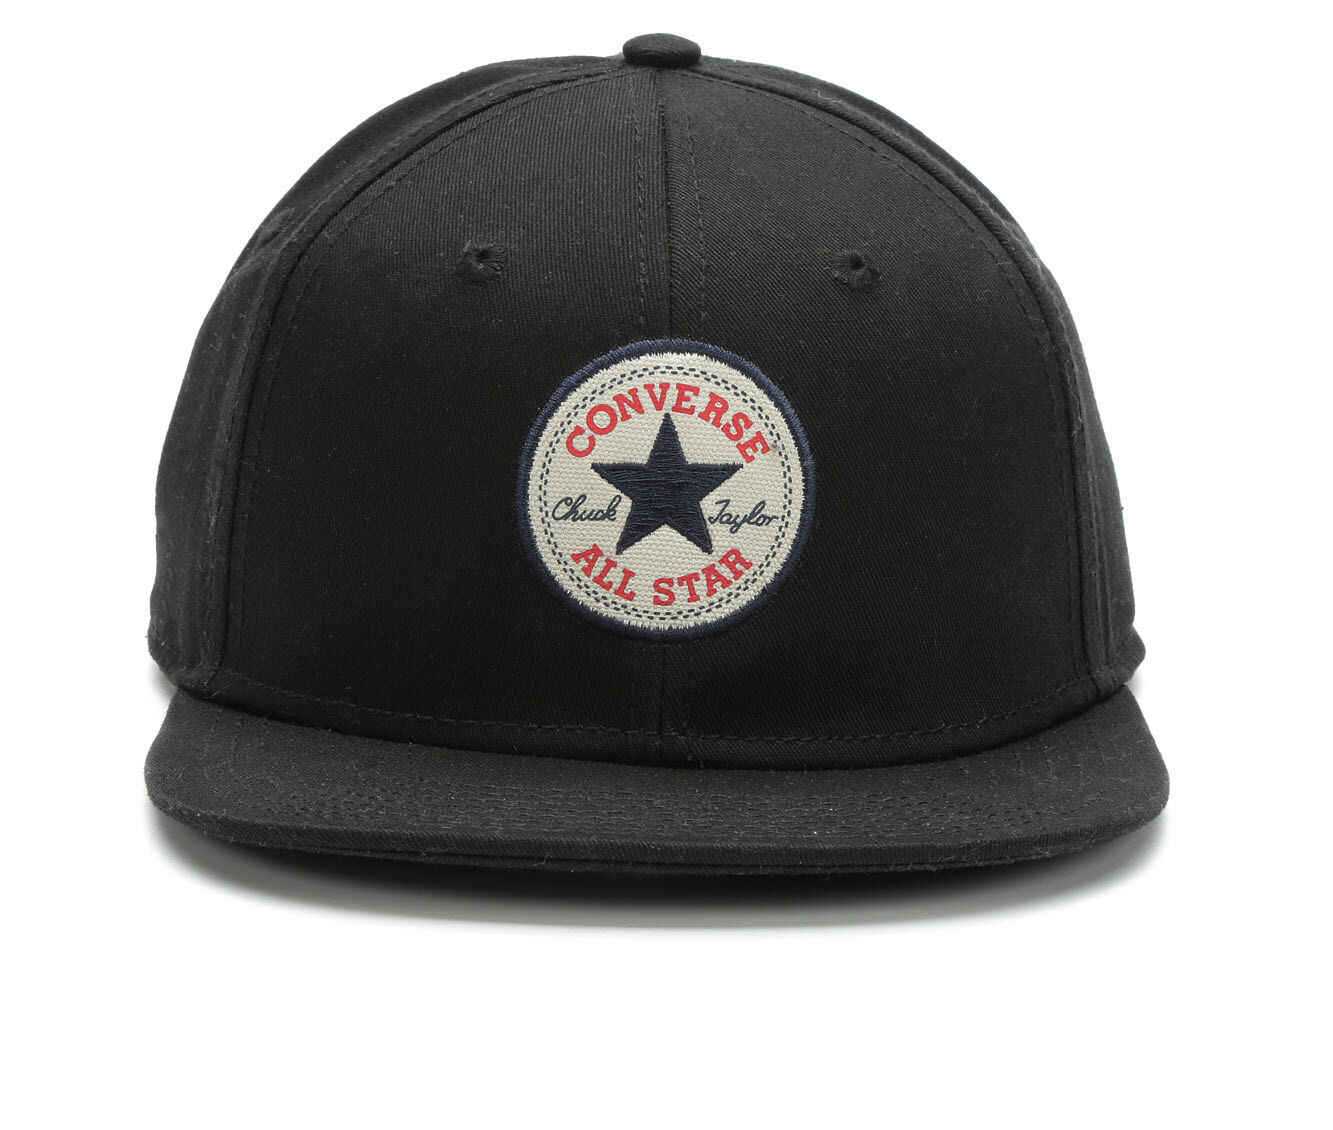 converse snapback cap